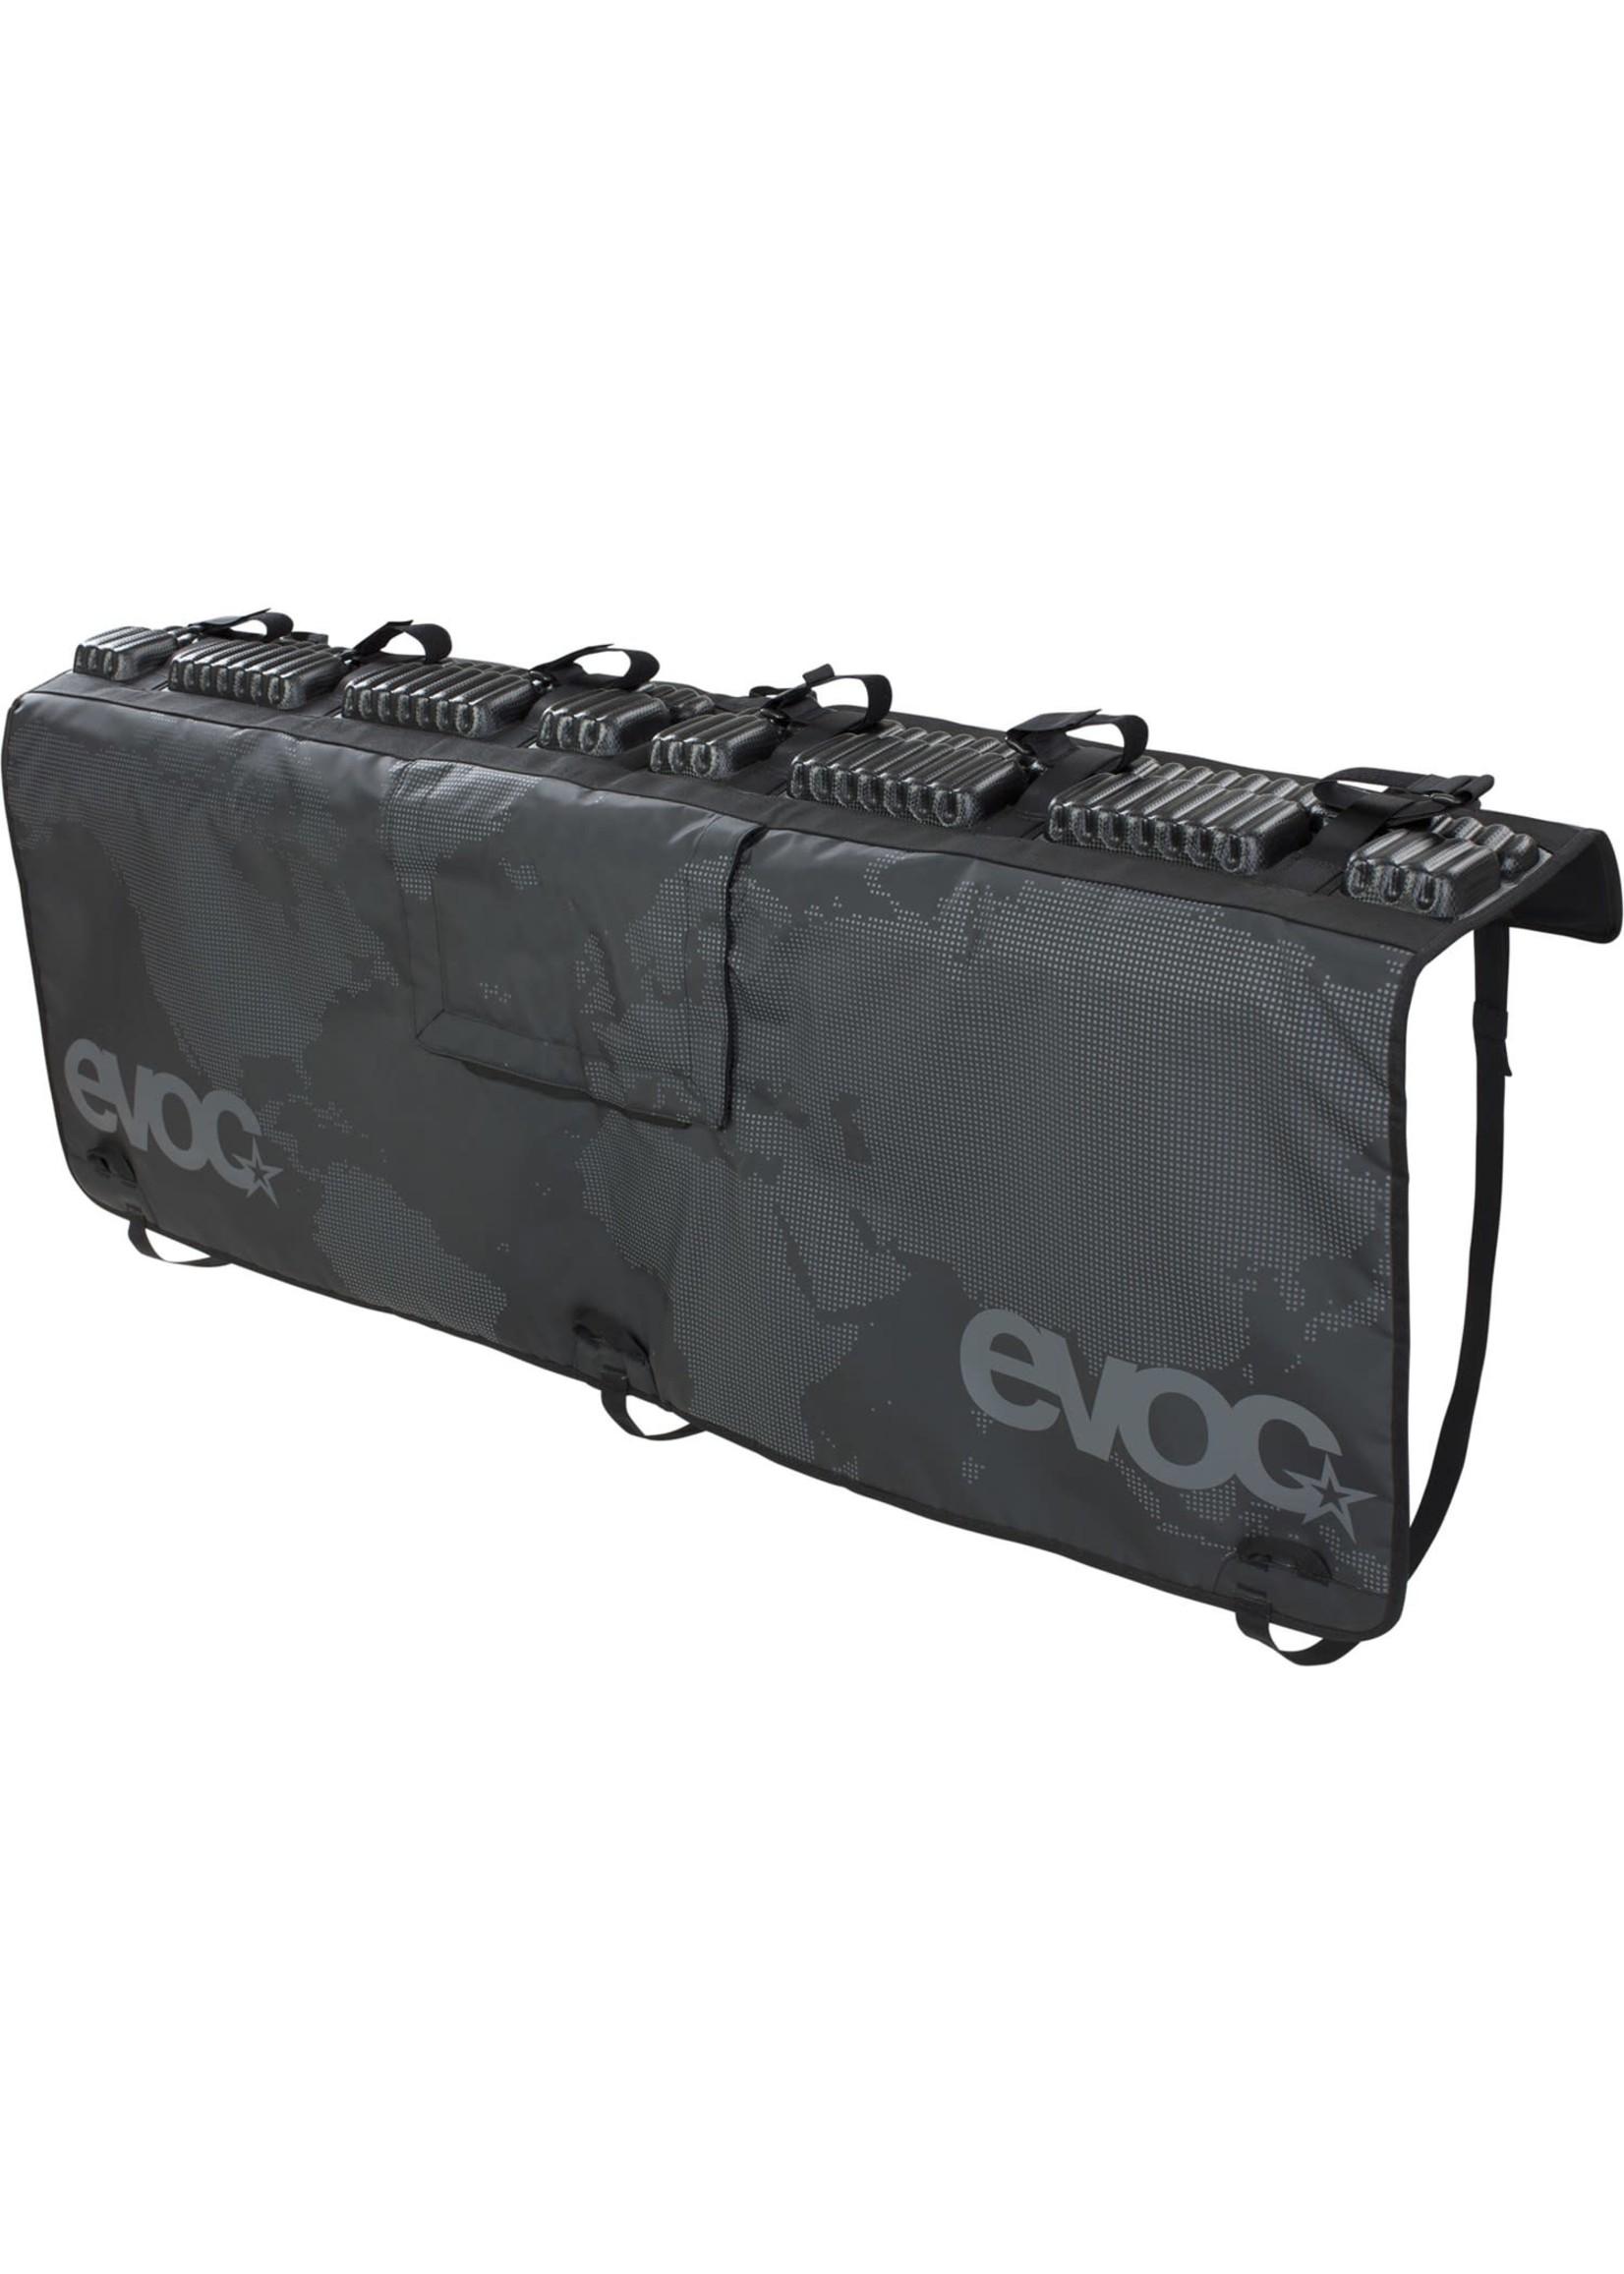 Evoc EVOC, Tailgate pad, Black, ML (136x85x2cm)